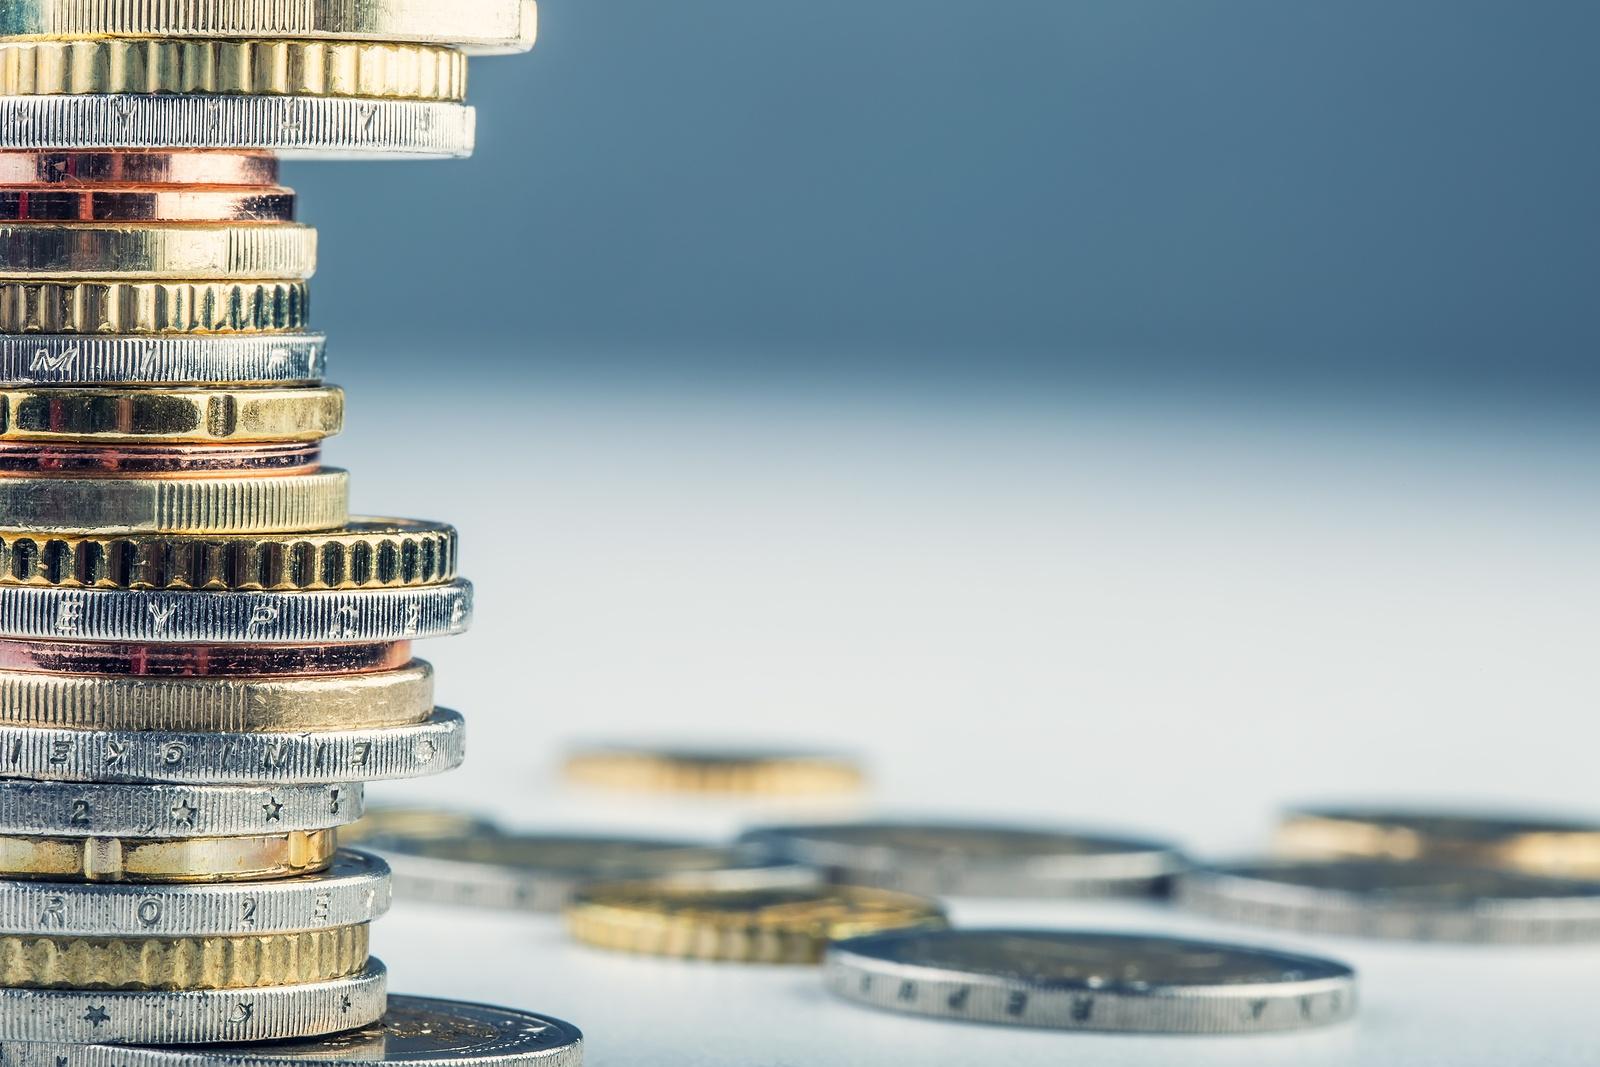 bigstock-Euro-coins-Euro-money-Euro-c-85476503.jpg